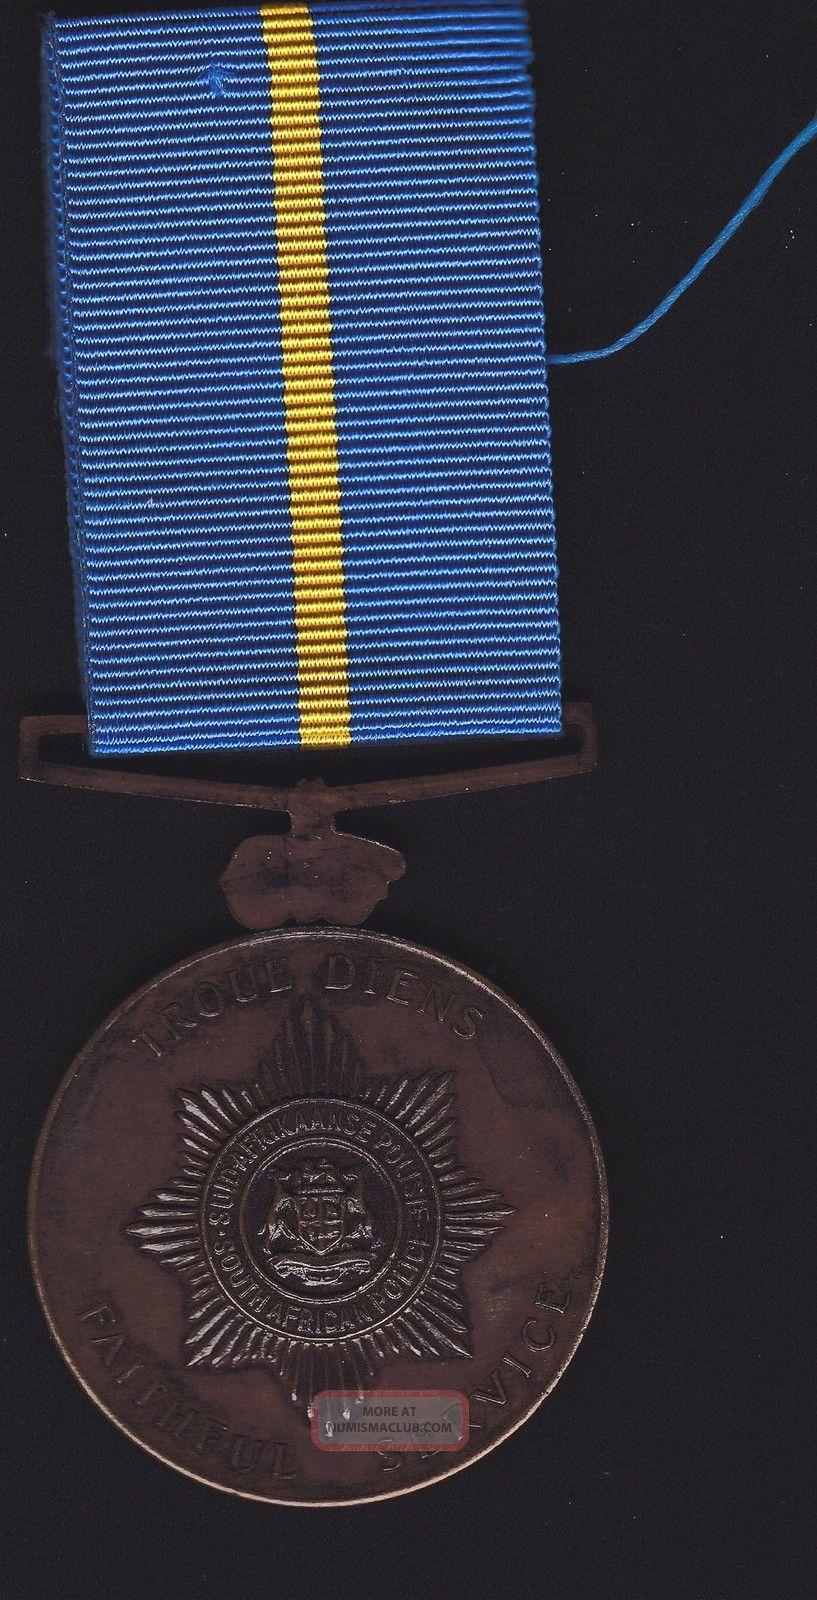 Sth Africa Police Faithful Service,  Unnamed Medal Exonumia photo